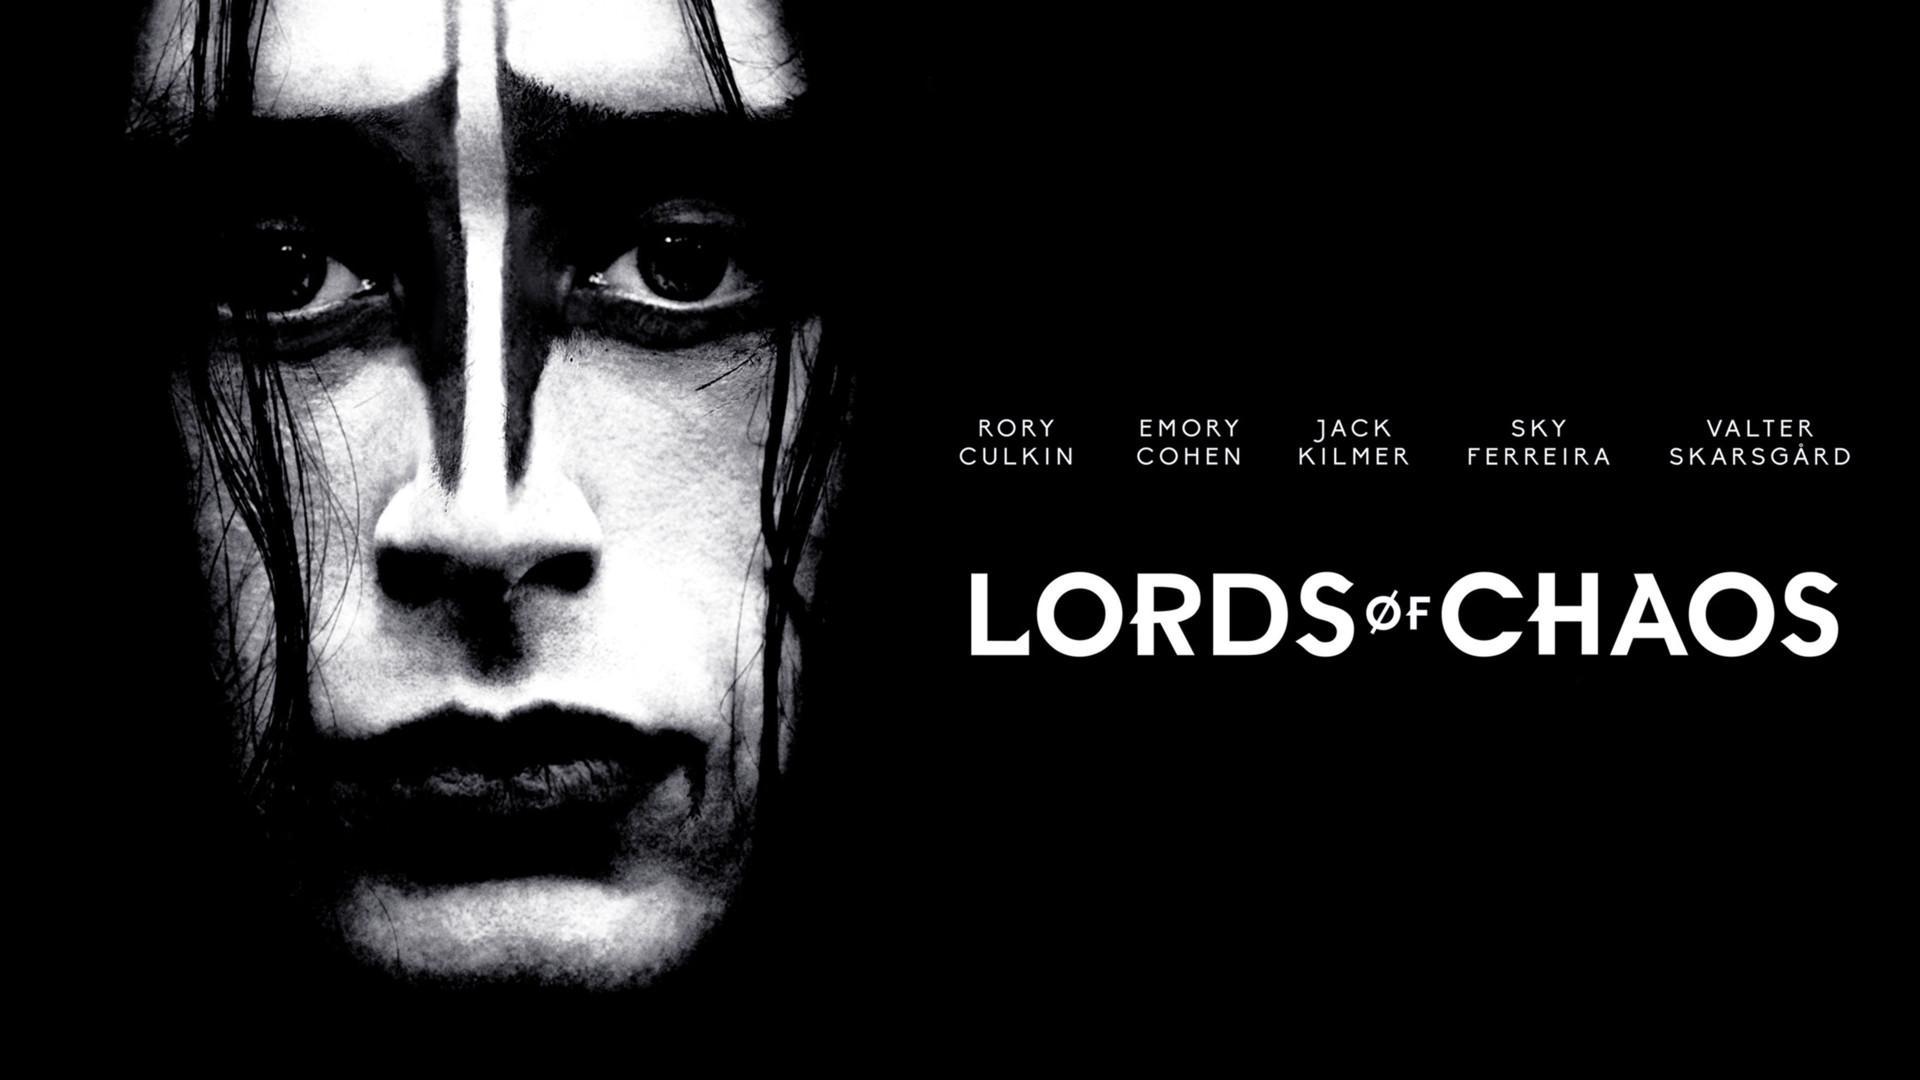 Lords of Chaos – A sötétség gyermekei (2018)